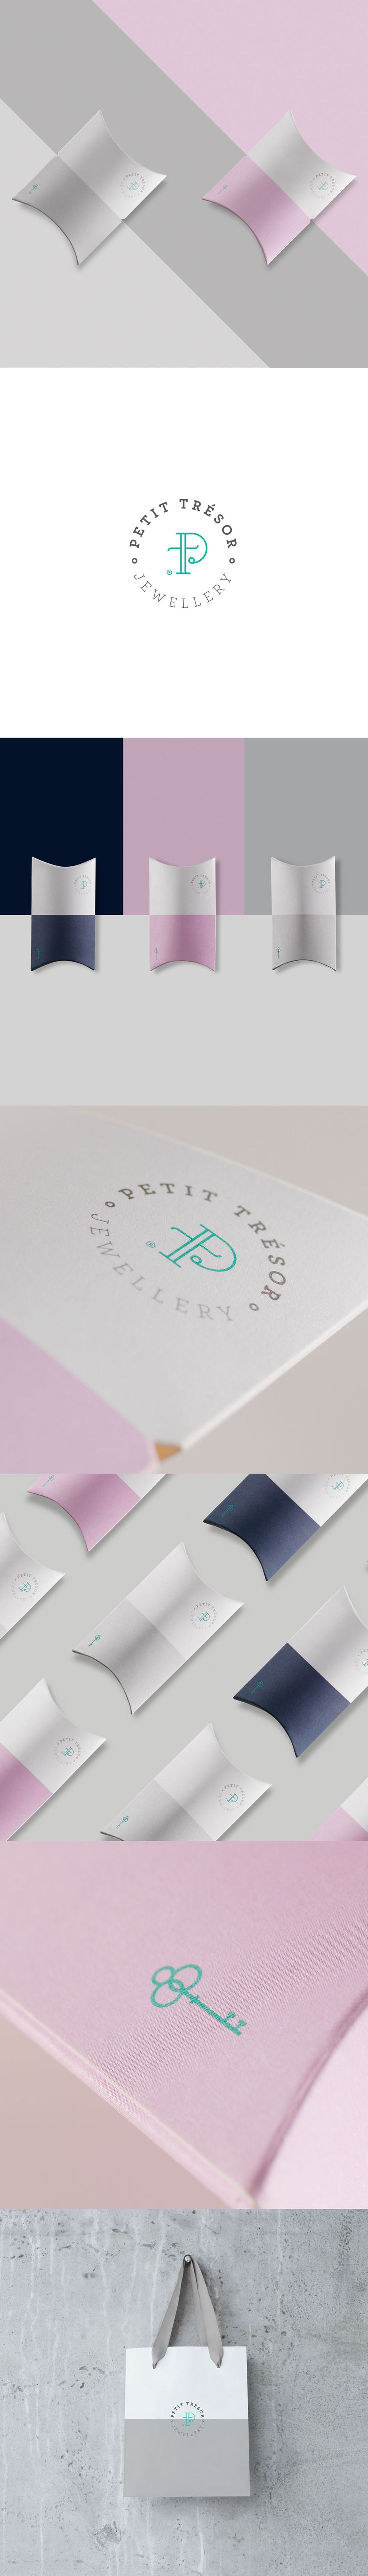 Petit Tresor jewellery, designed by 2yolk